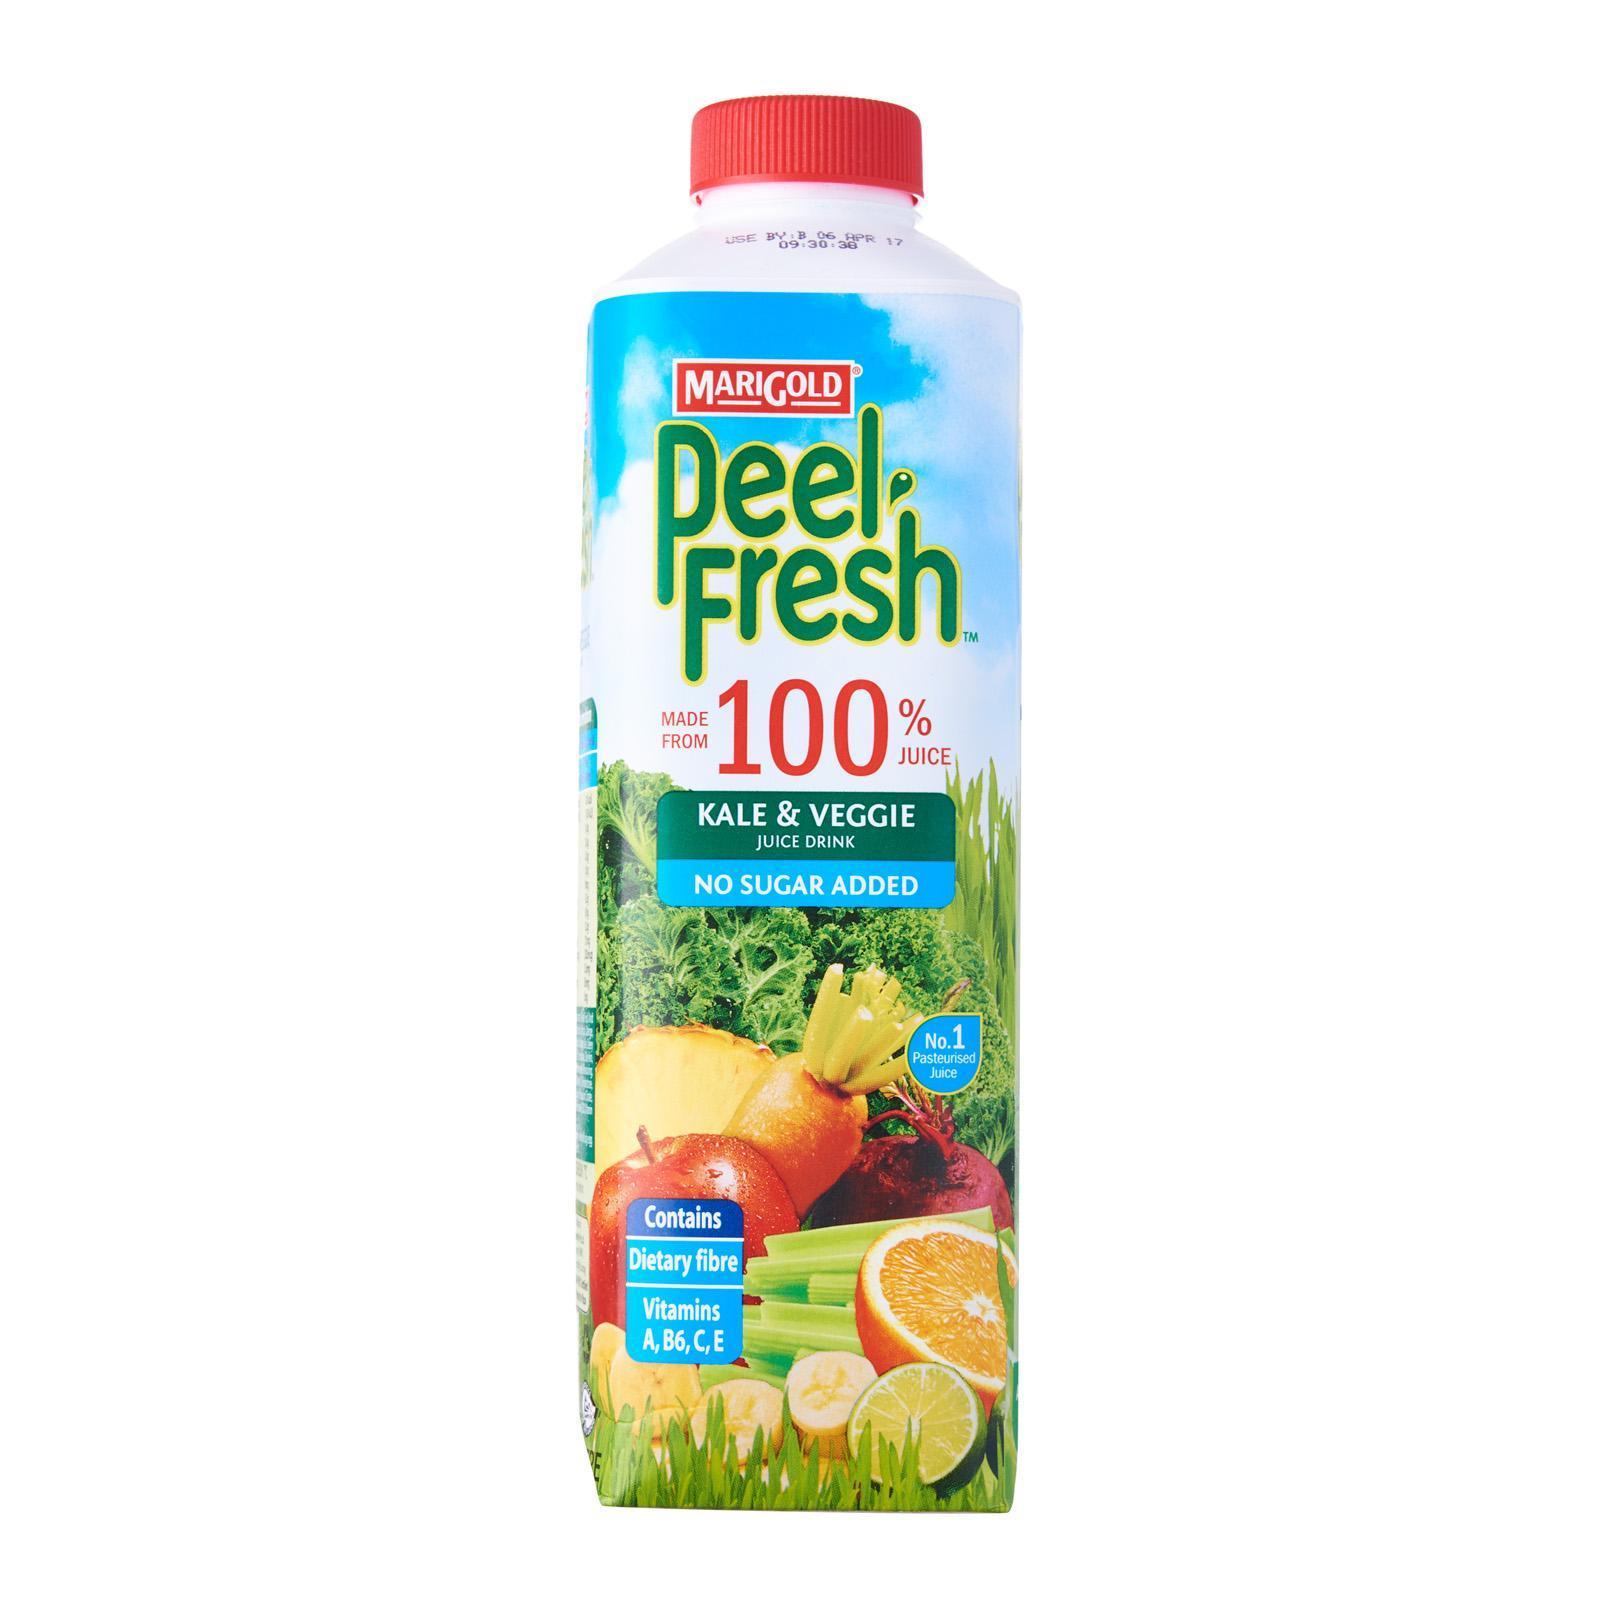 MARIGOLD Peel Fresh No Sugar Added Juice Drink - Kale and Veggie